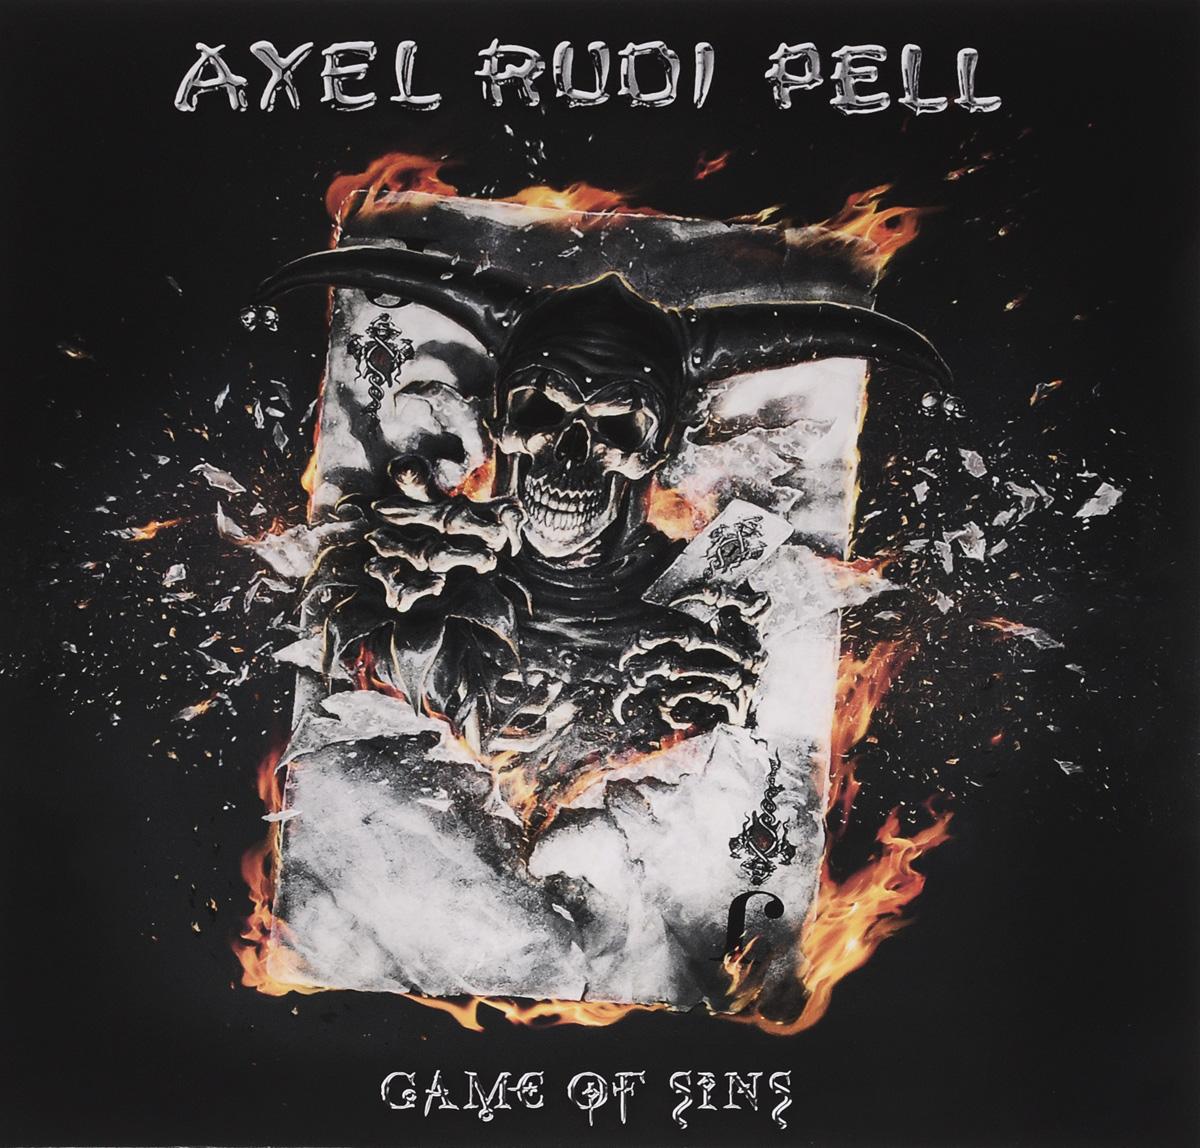 Аксель Руди Пелл Axel Rudi Pell. Game Of Sins (2 LP + CD)